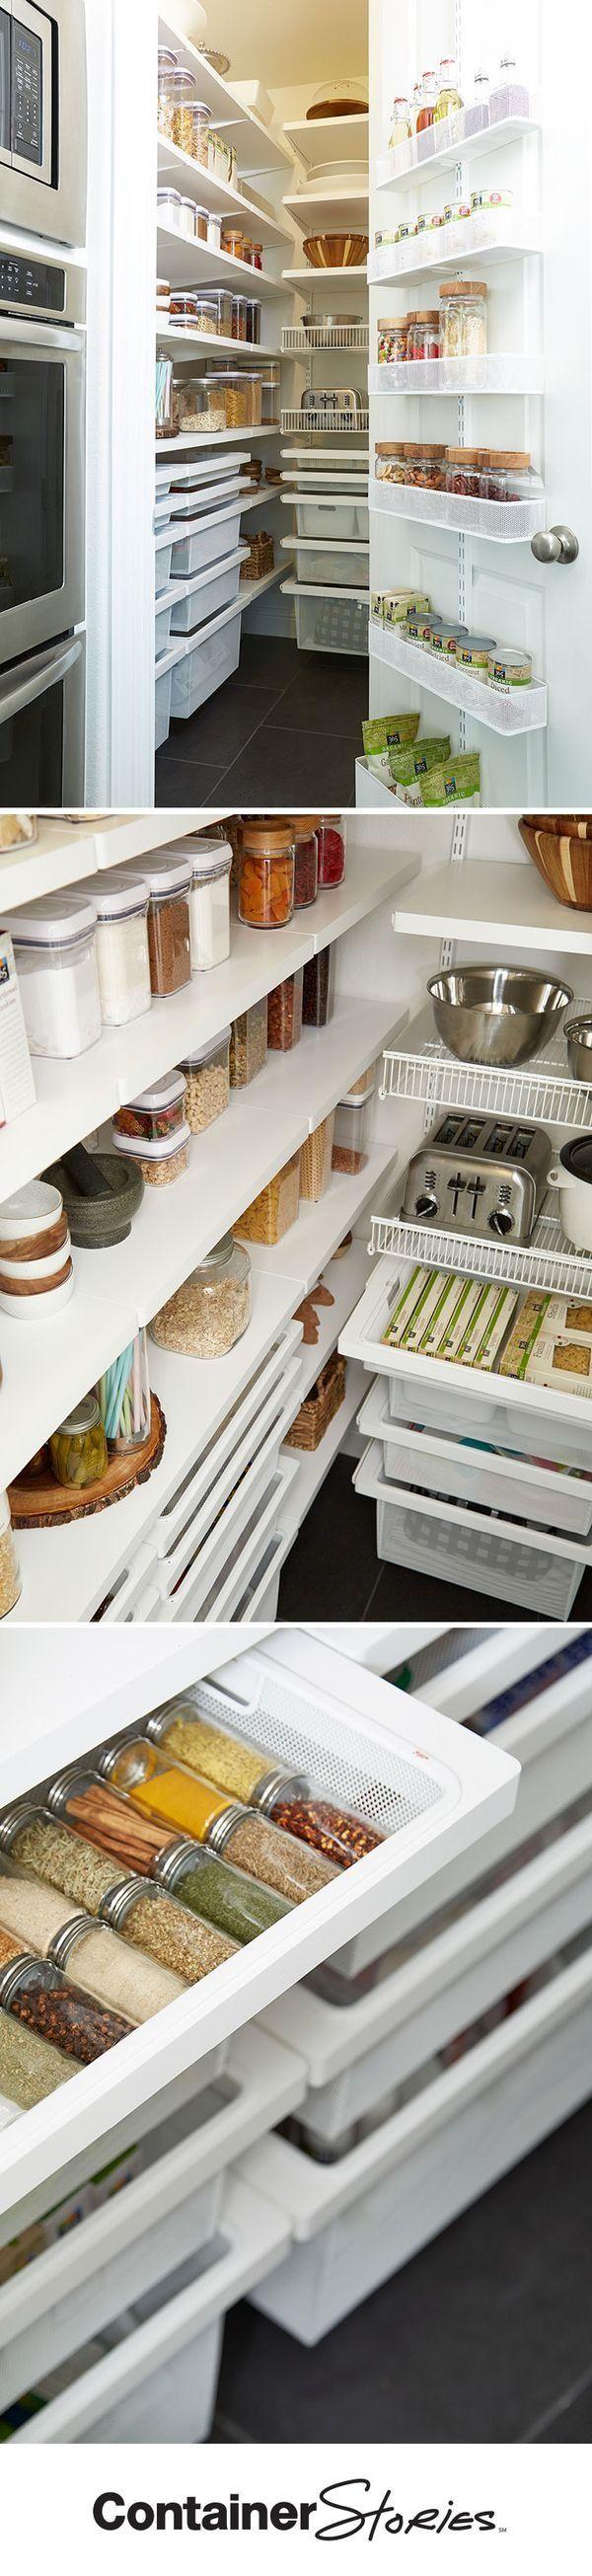 From An Elfa Utility Door U0026 Wall Rack To Elfa Decor Drawers, Shelves And  Shelf